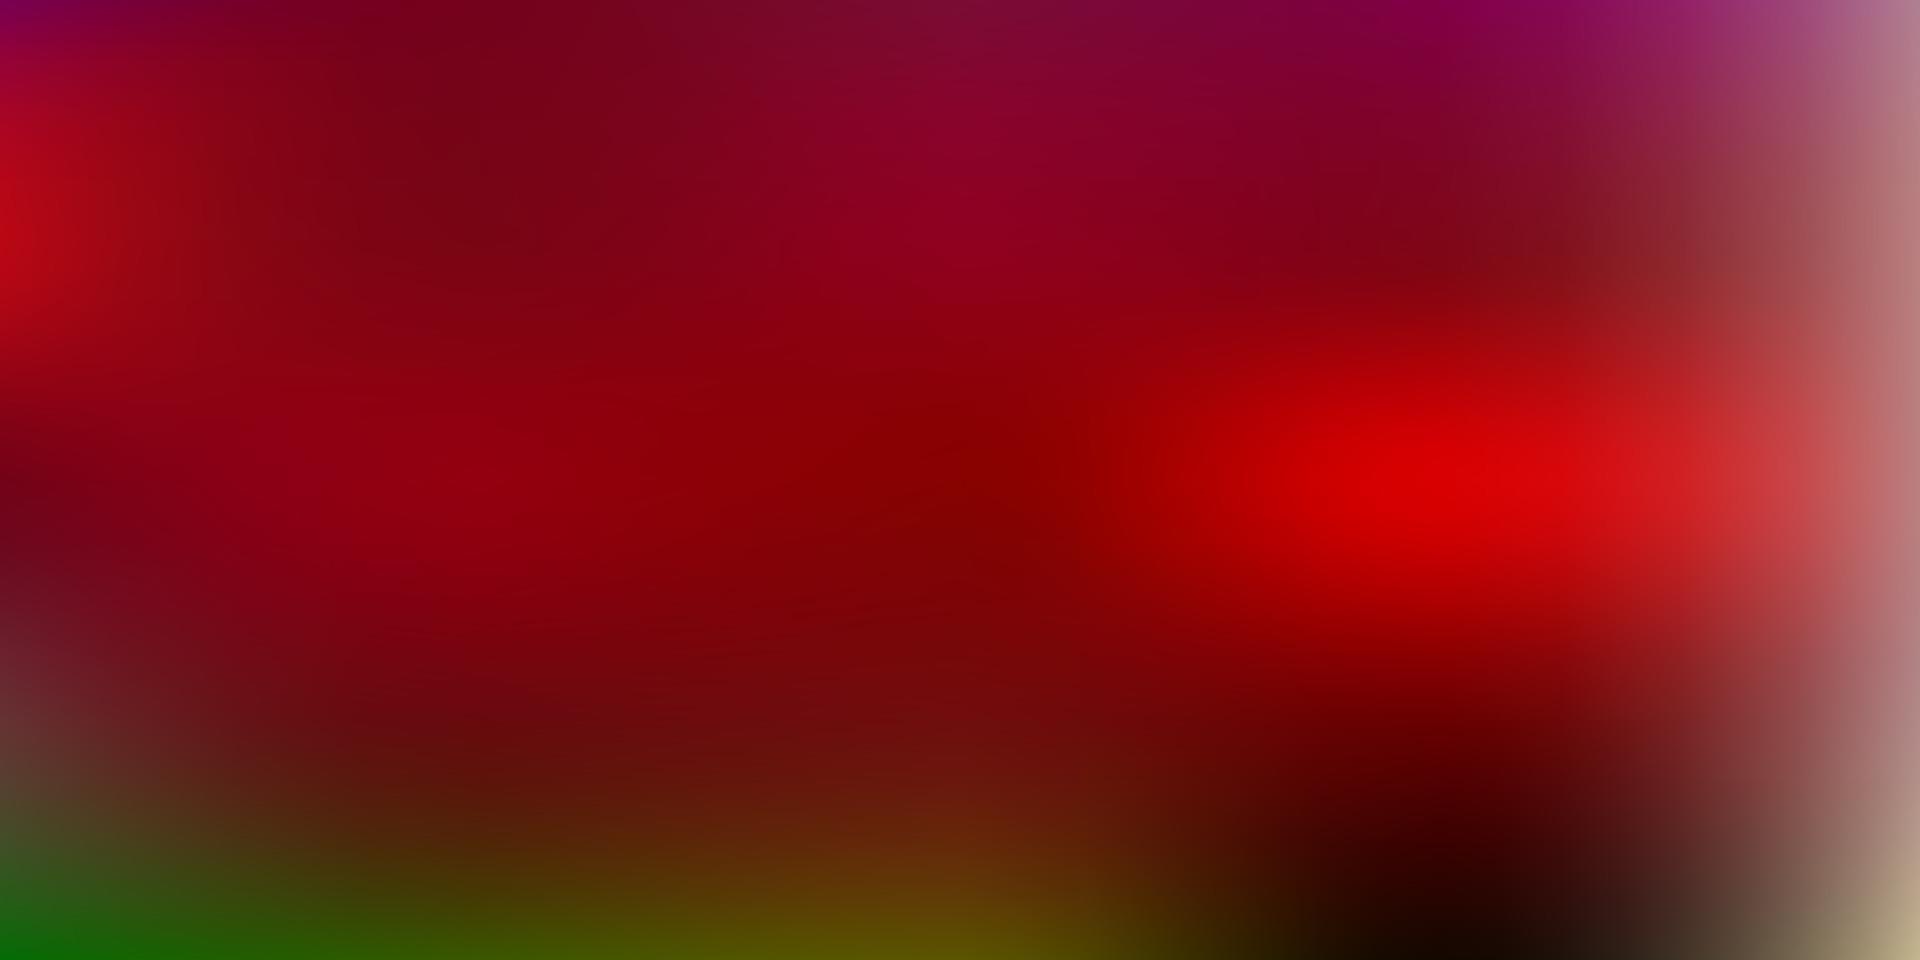 lichtroze, groene vector onscherpe achtergrond.